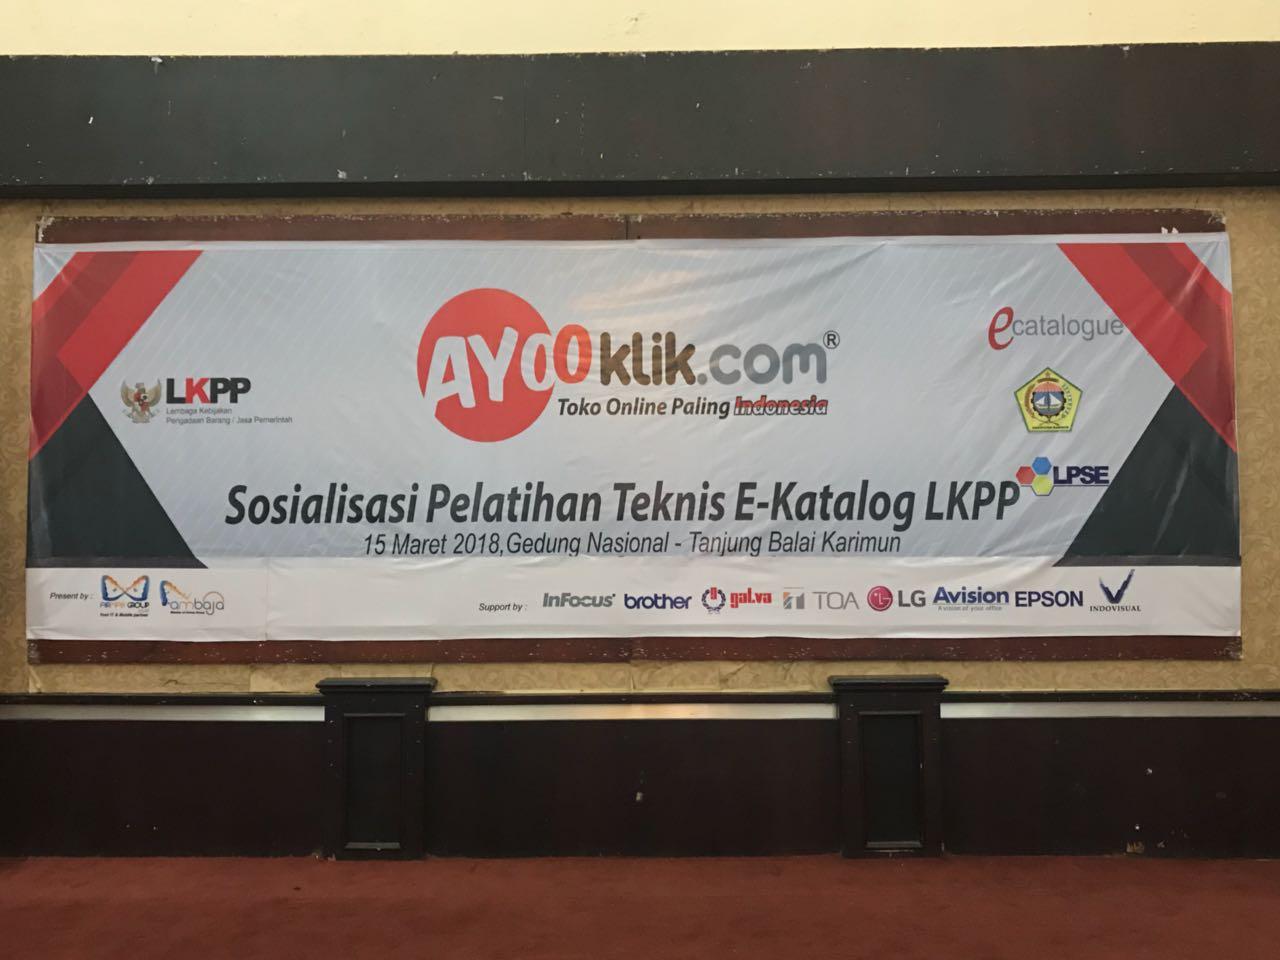 Sosialisasi e-katalog LKPP Tanjung Balai Karimun